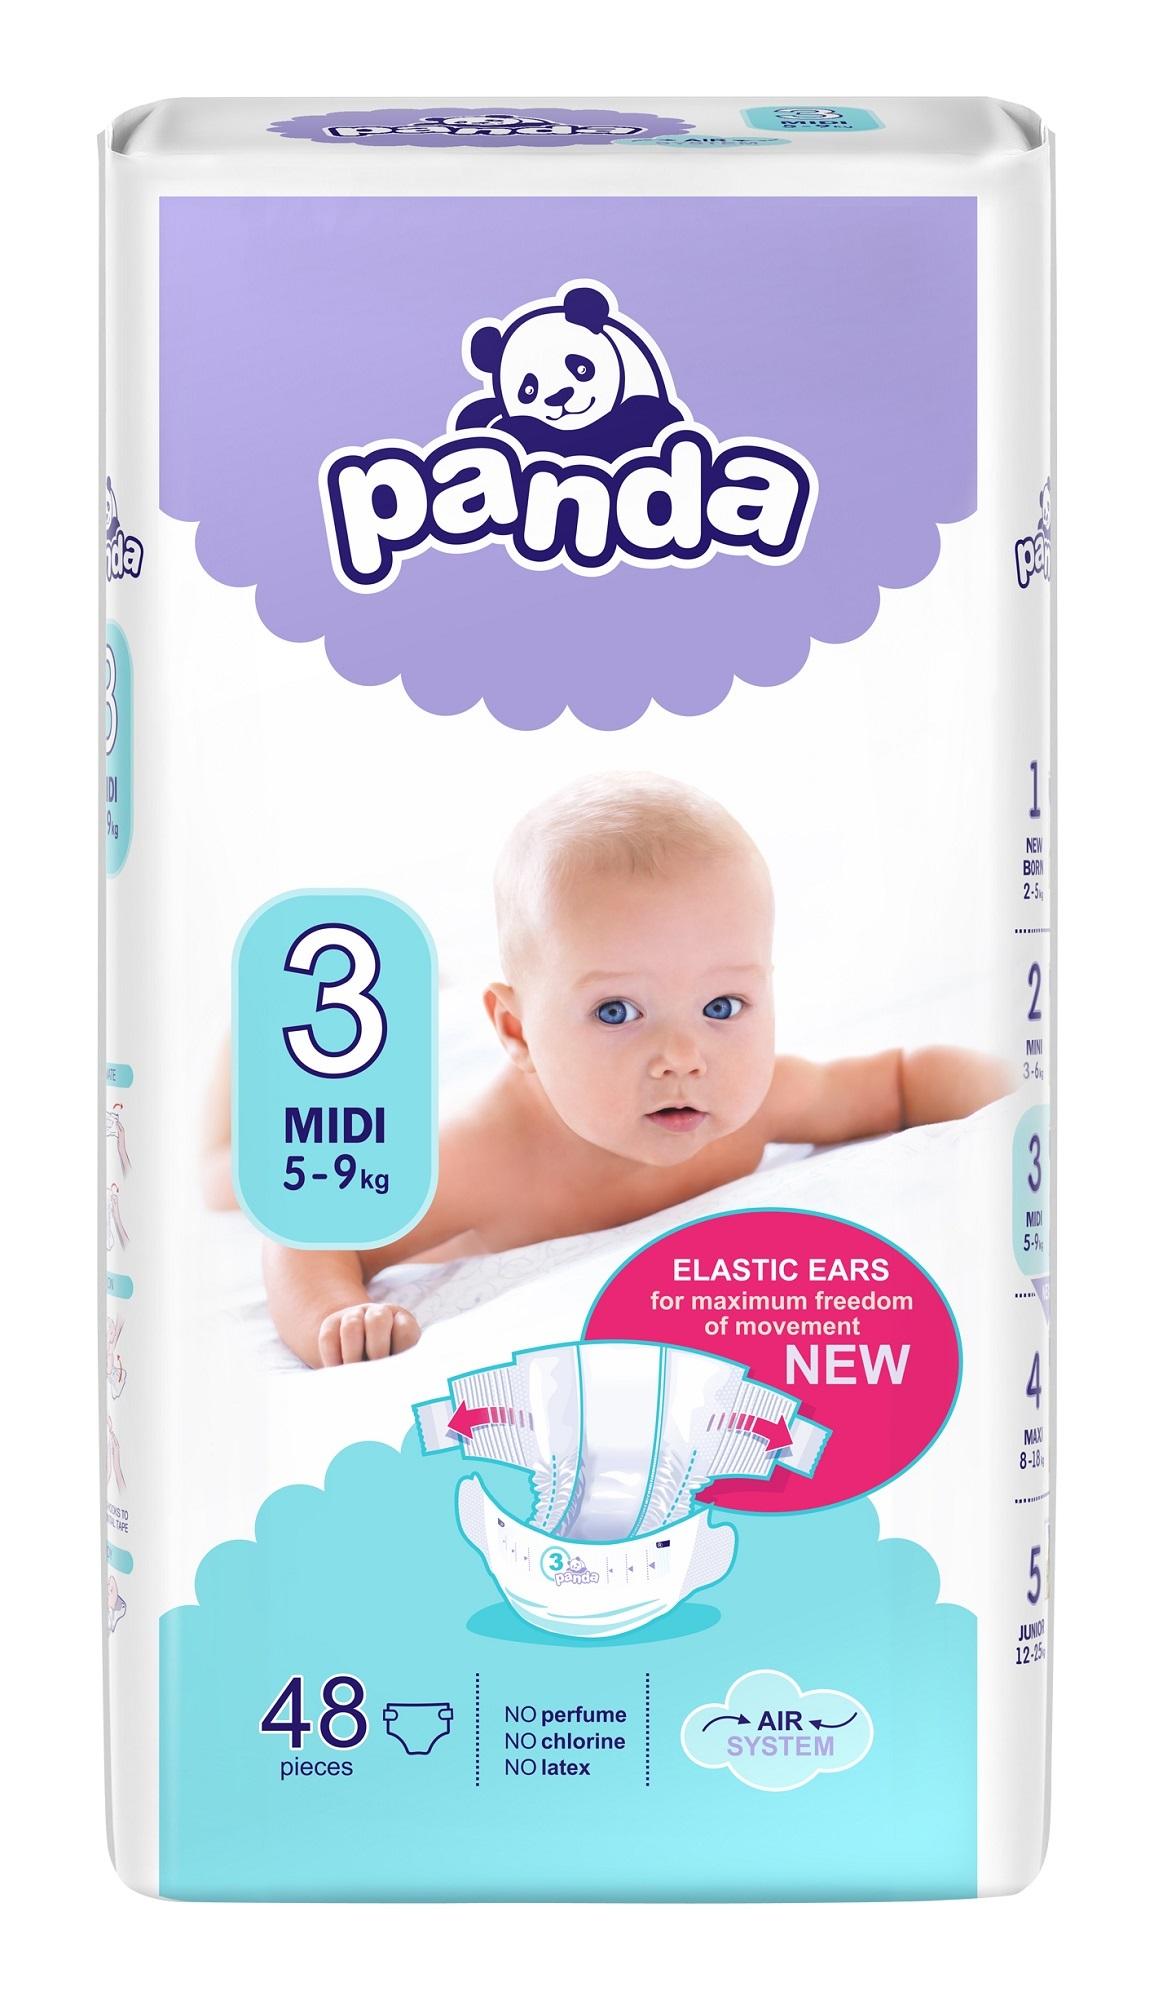 Panda Midi dětské pleny 48ks 5-9kg